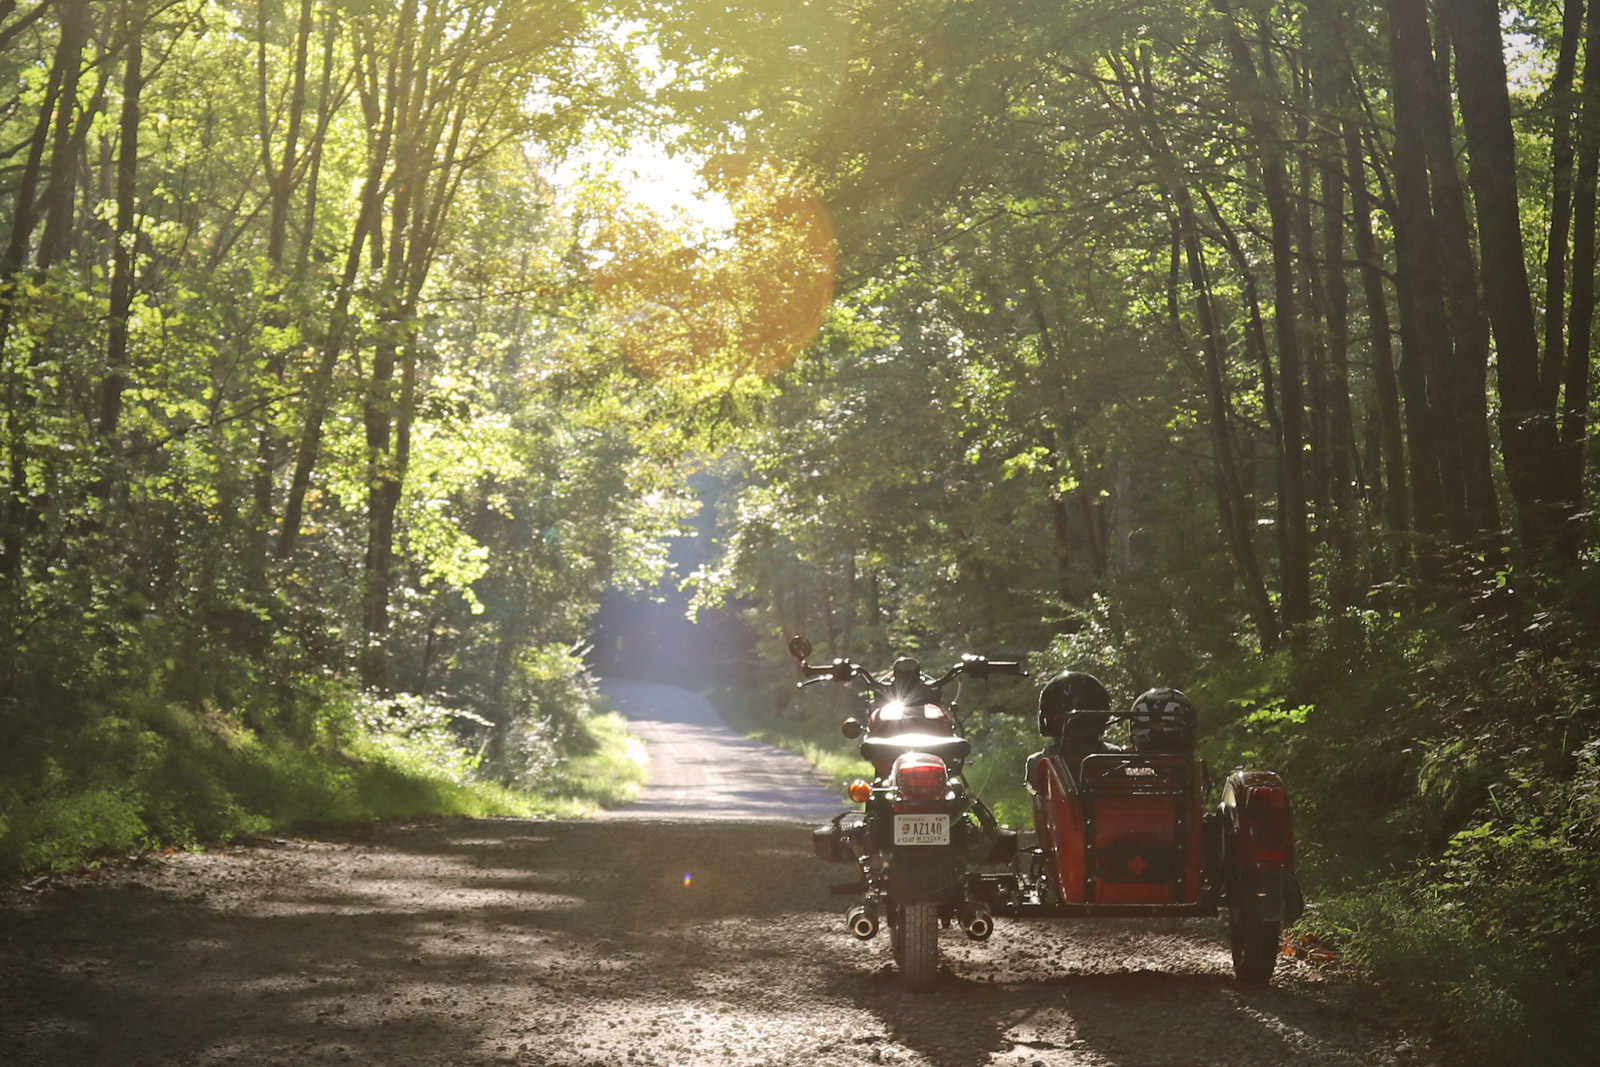 Ural cT touring gravel road